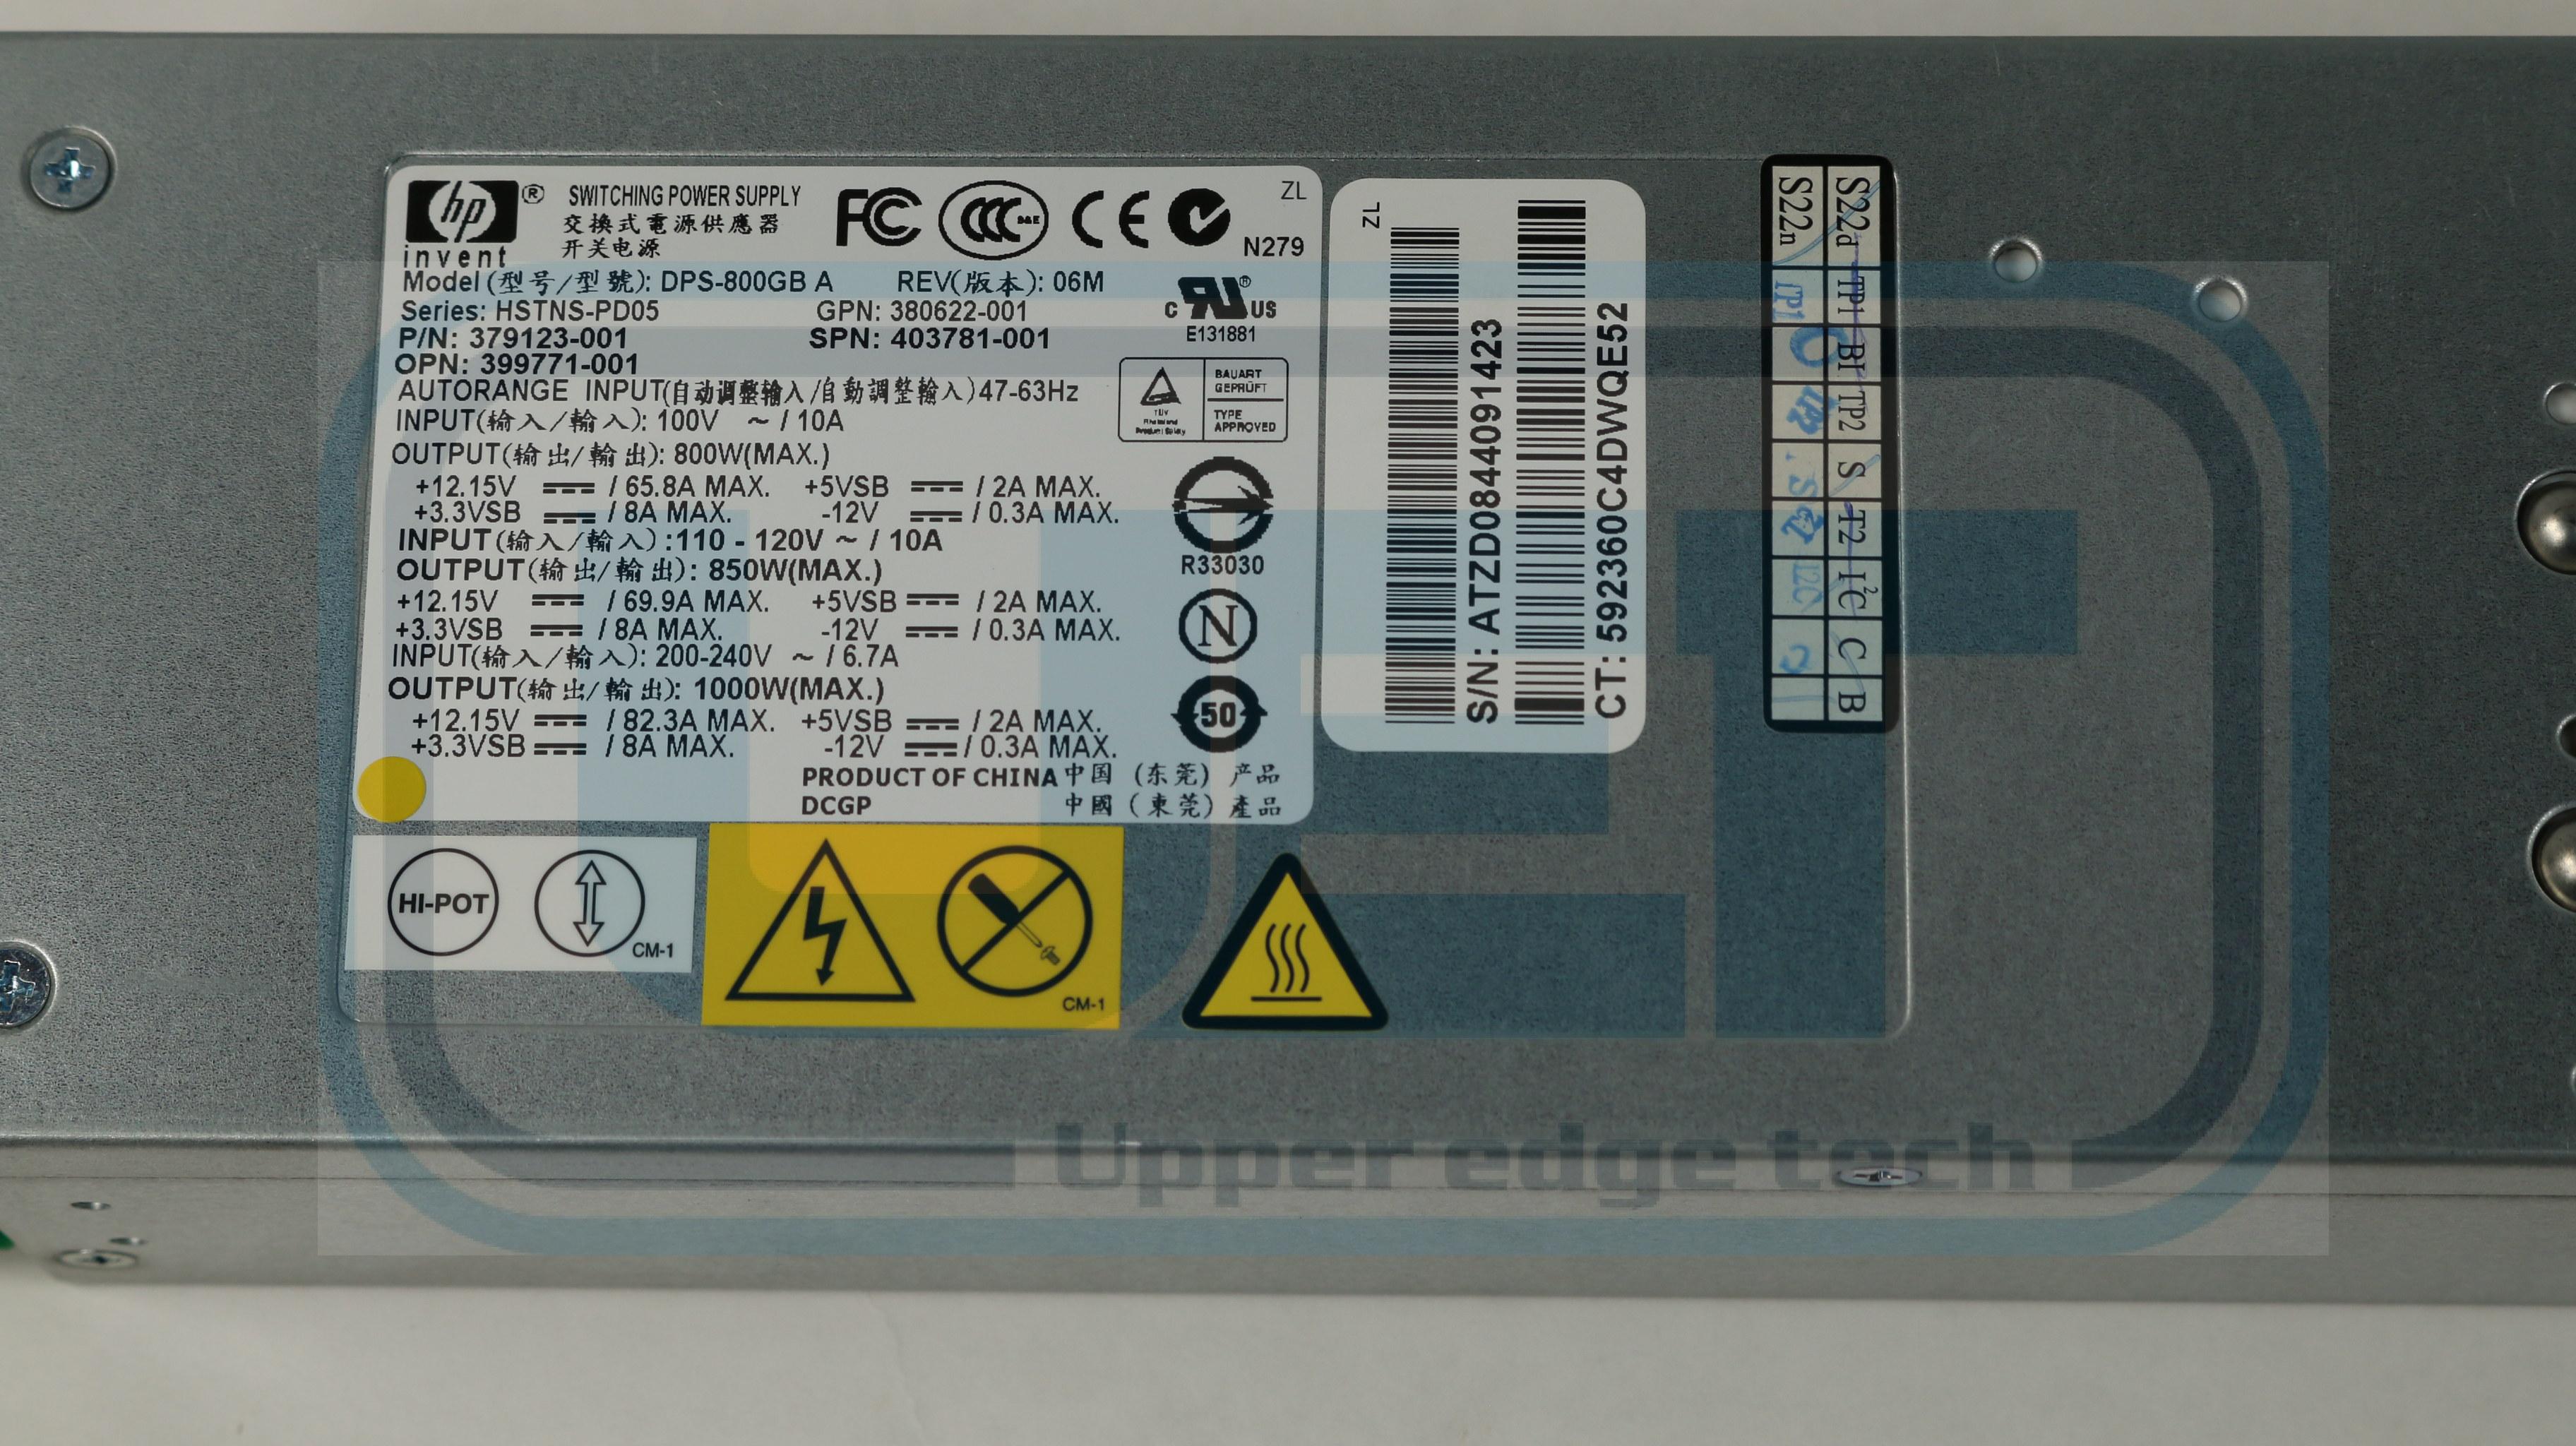 HP Proliant DL360E 754376-001 900W Power Supply Tested Warranty